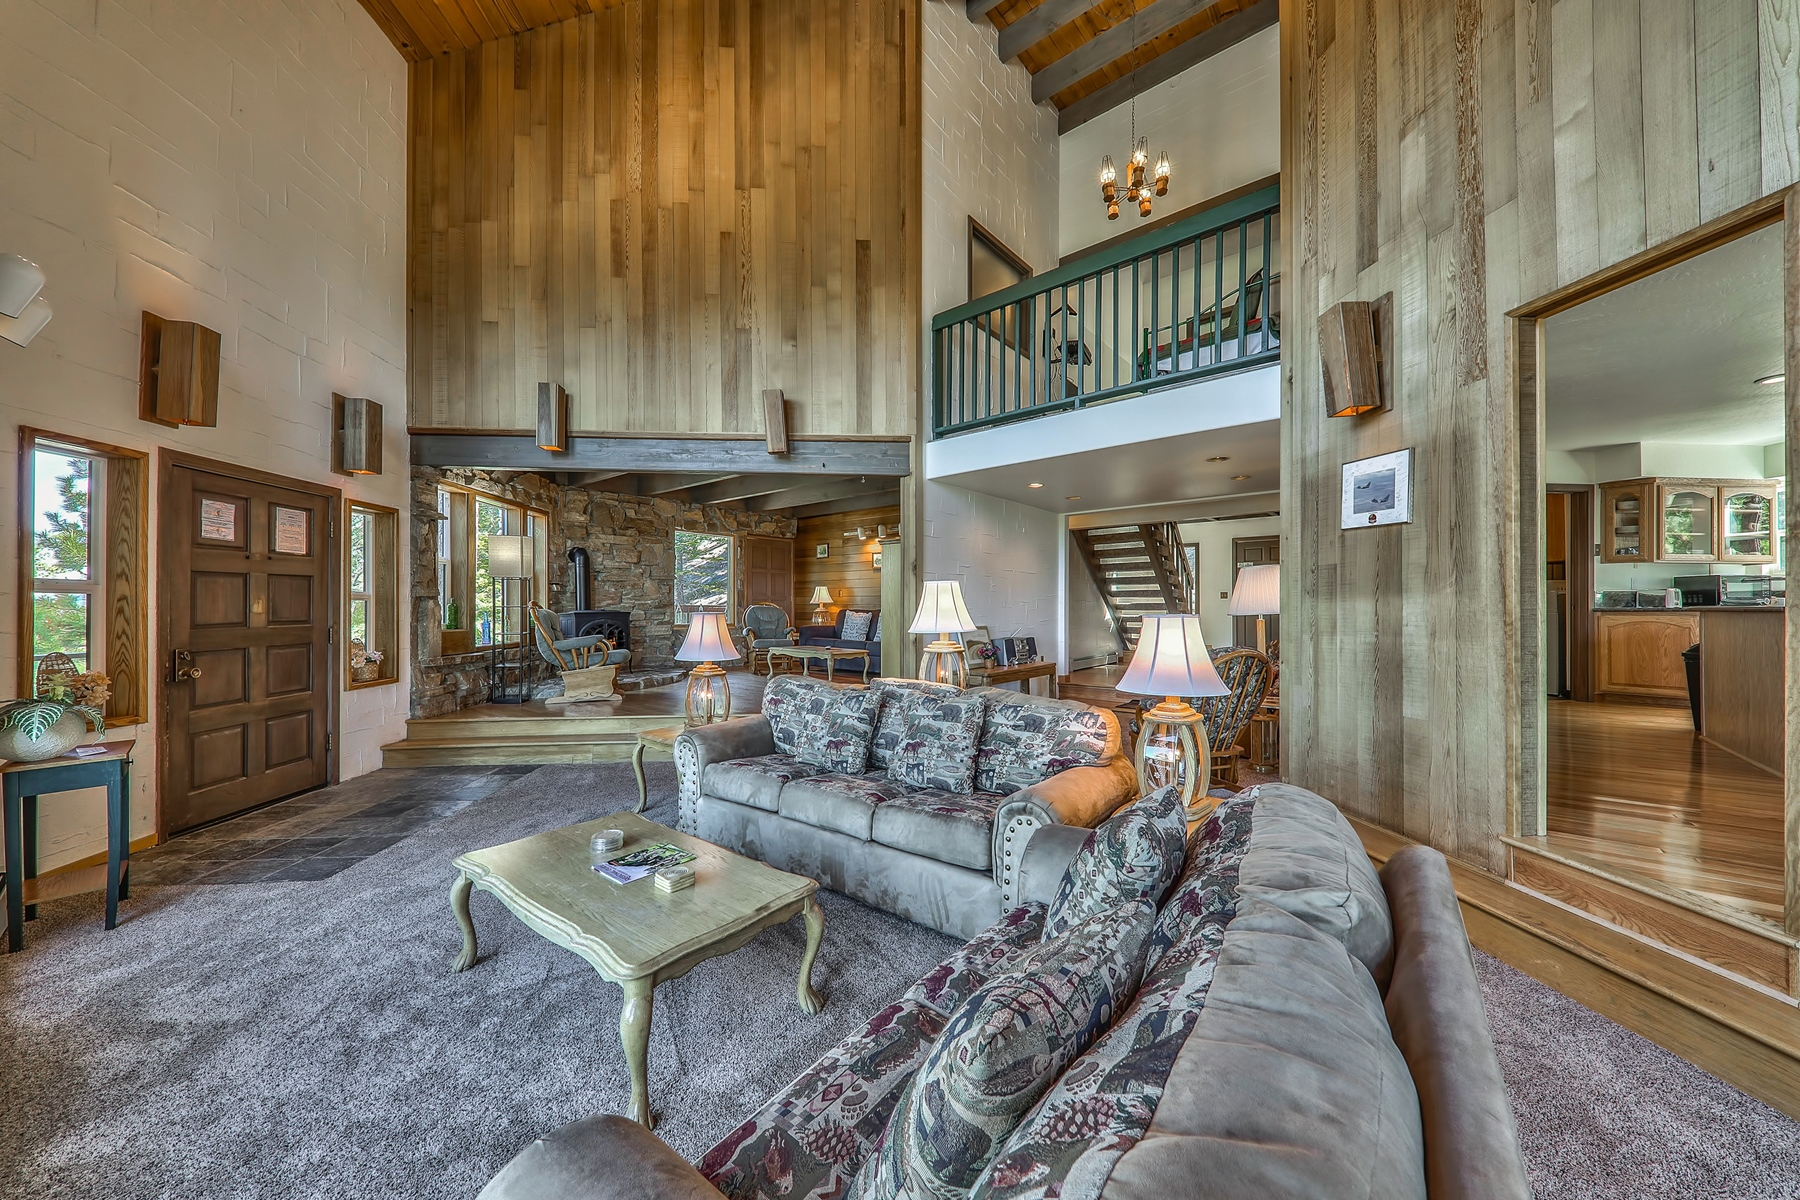 Additional photo for property listing at 1720 Keller Road, South Lake Tahoe, CA 96150 1720 Keller Road 南太浩湖, 加利福尼亚州 96150 美国